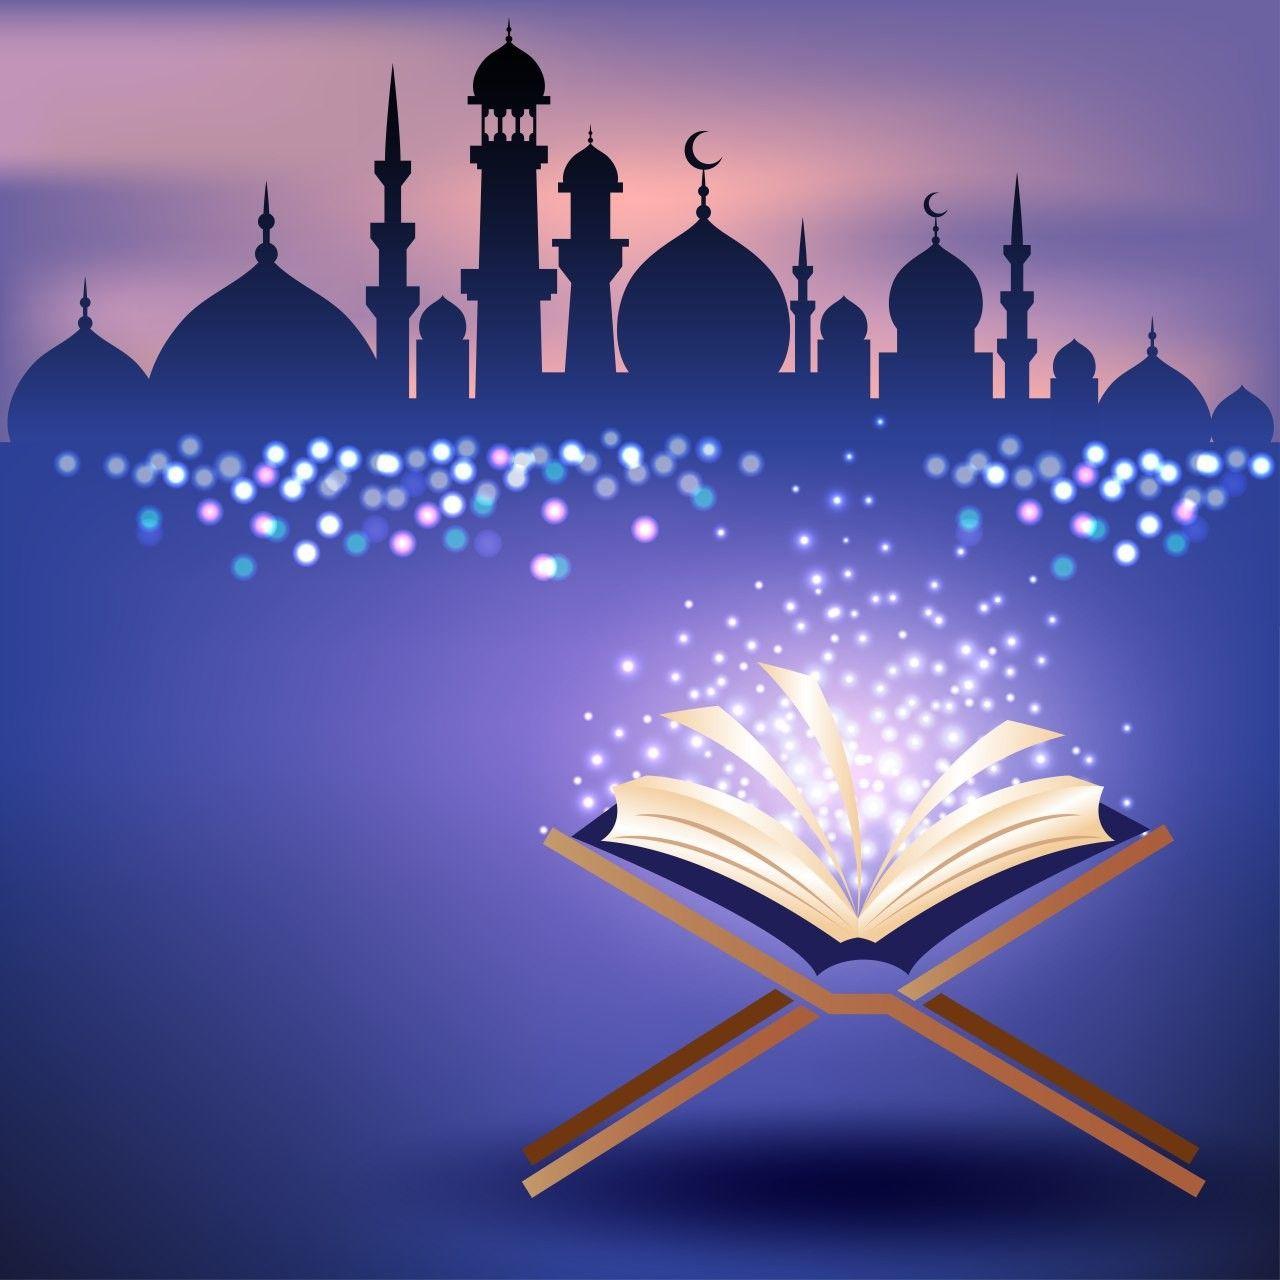 Pin Oleh Shaimaa Di بطاقات لرمضان للكتابة عليها Seni Islamis Agama Spanduk